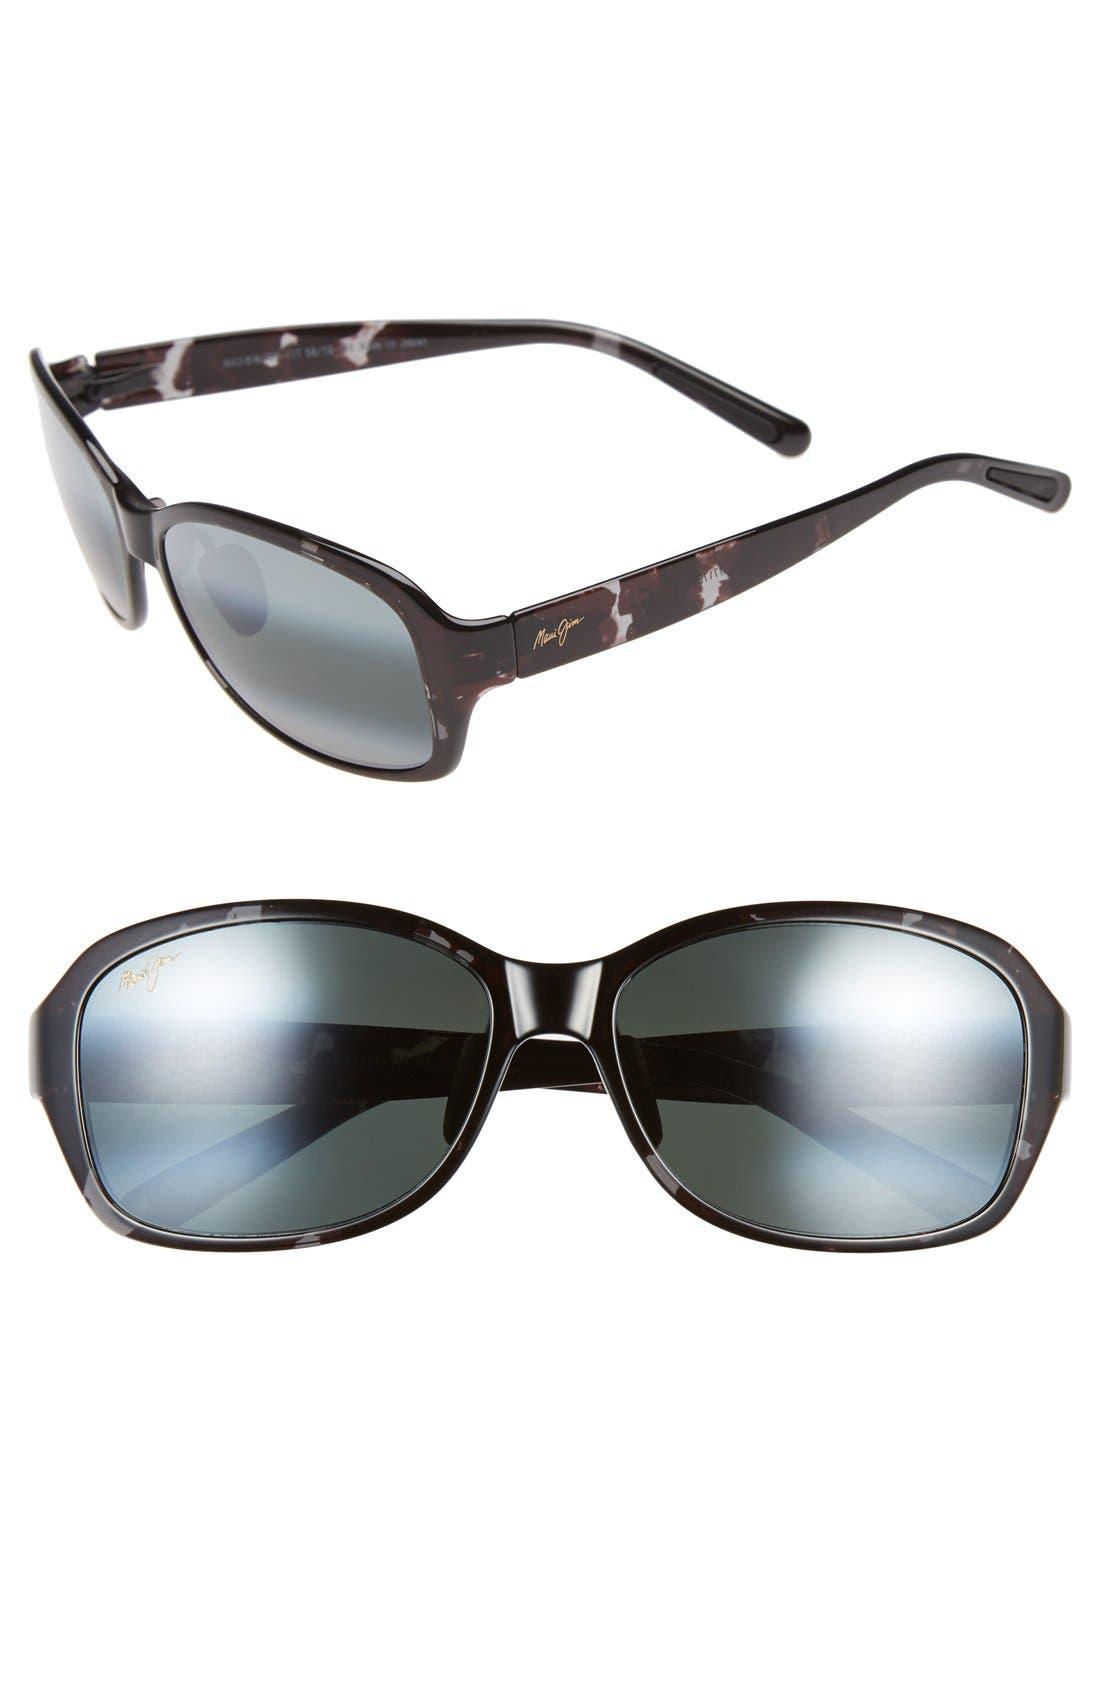 Koki Beach 56mm PolarizedPlus2<sup>®</sup> Sunglasses,                         Main,                         color, Black And Grey Tortoise/ Grey